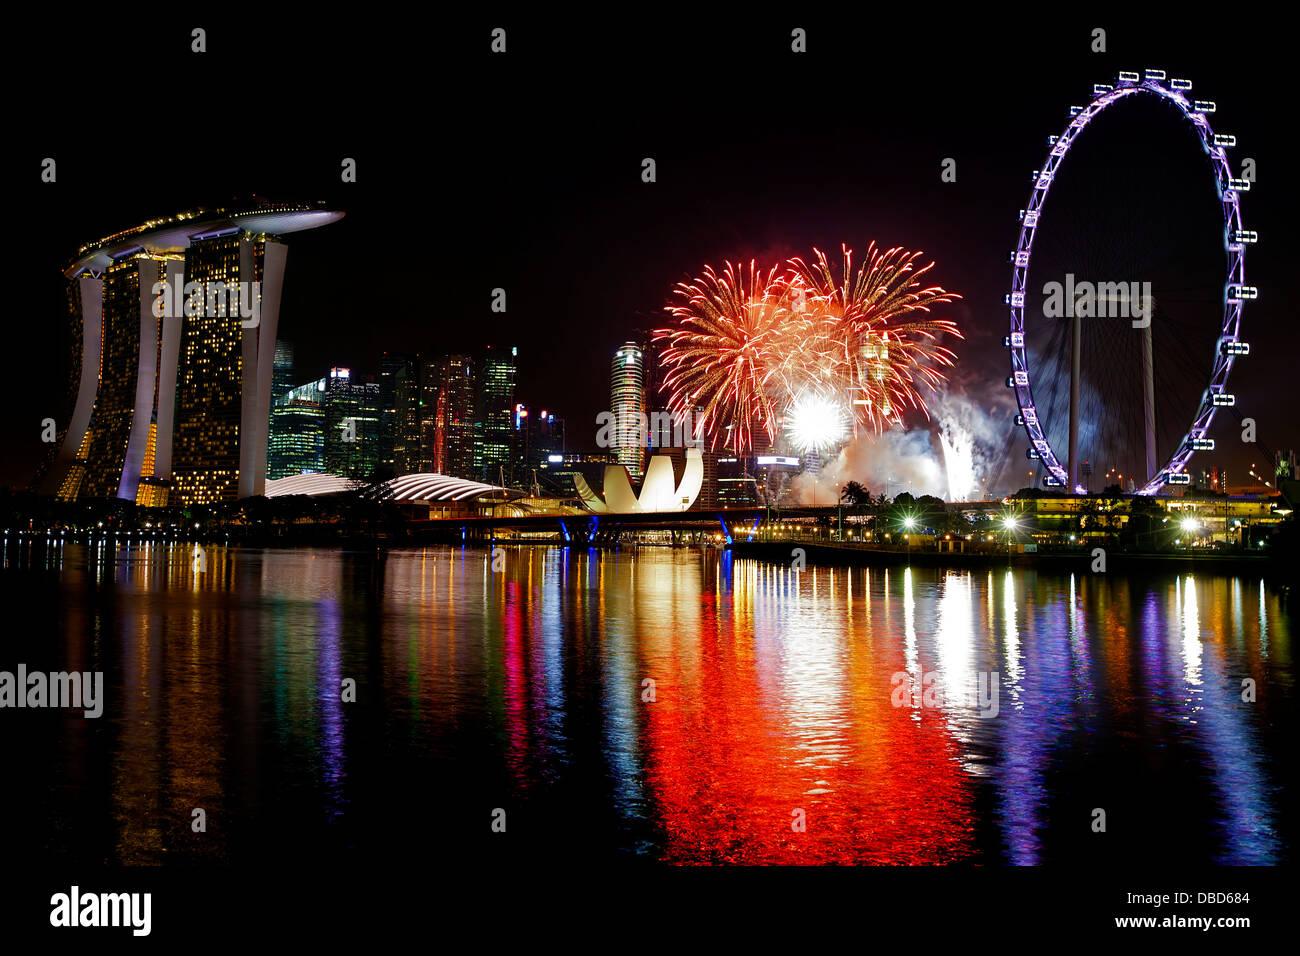 Singapore Fireworks - Stock Image